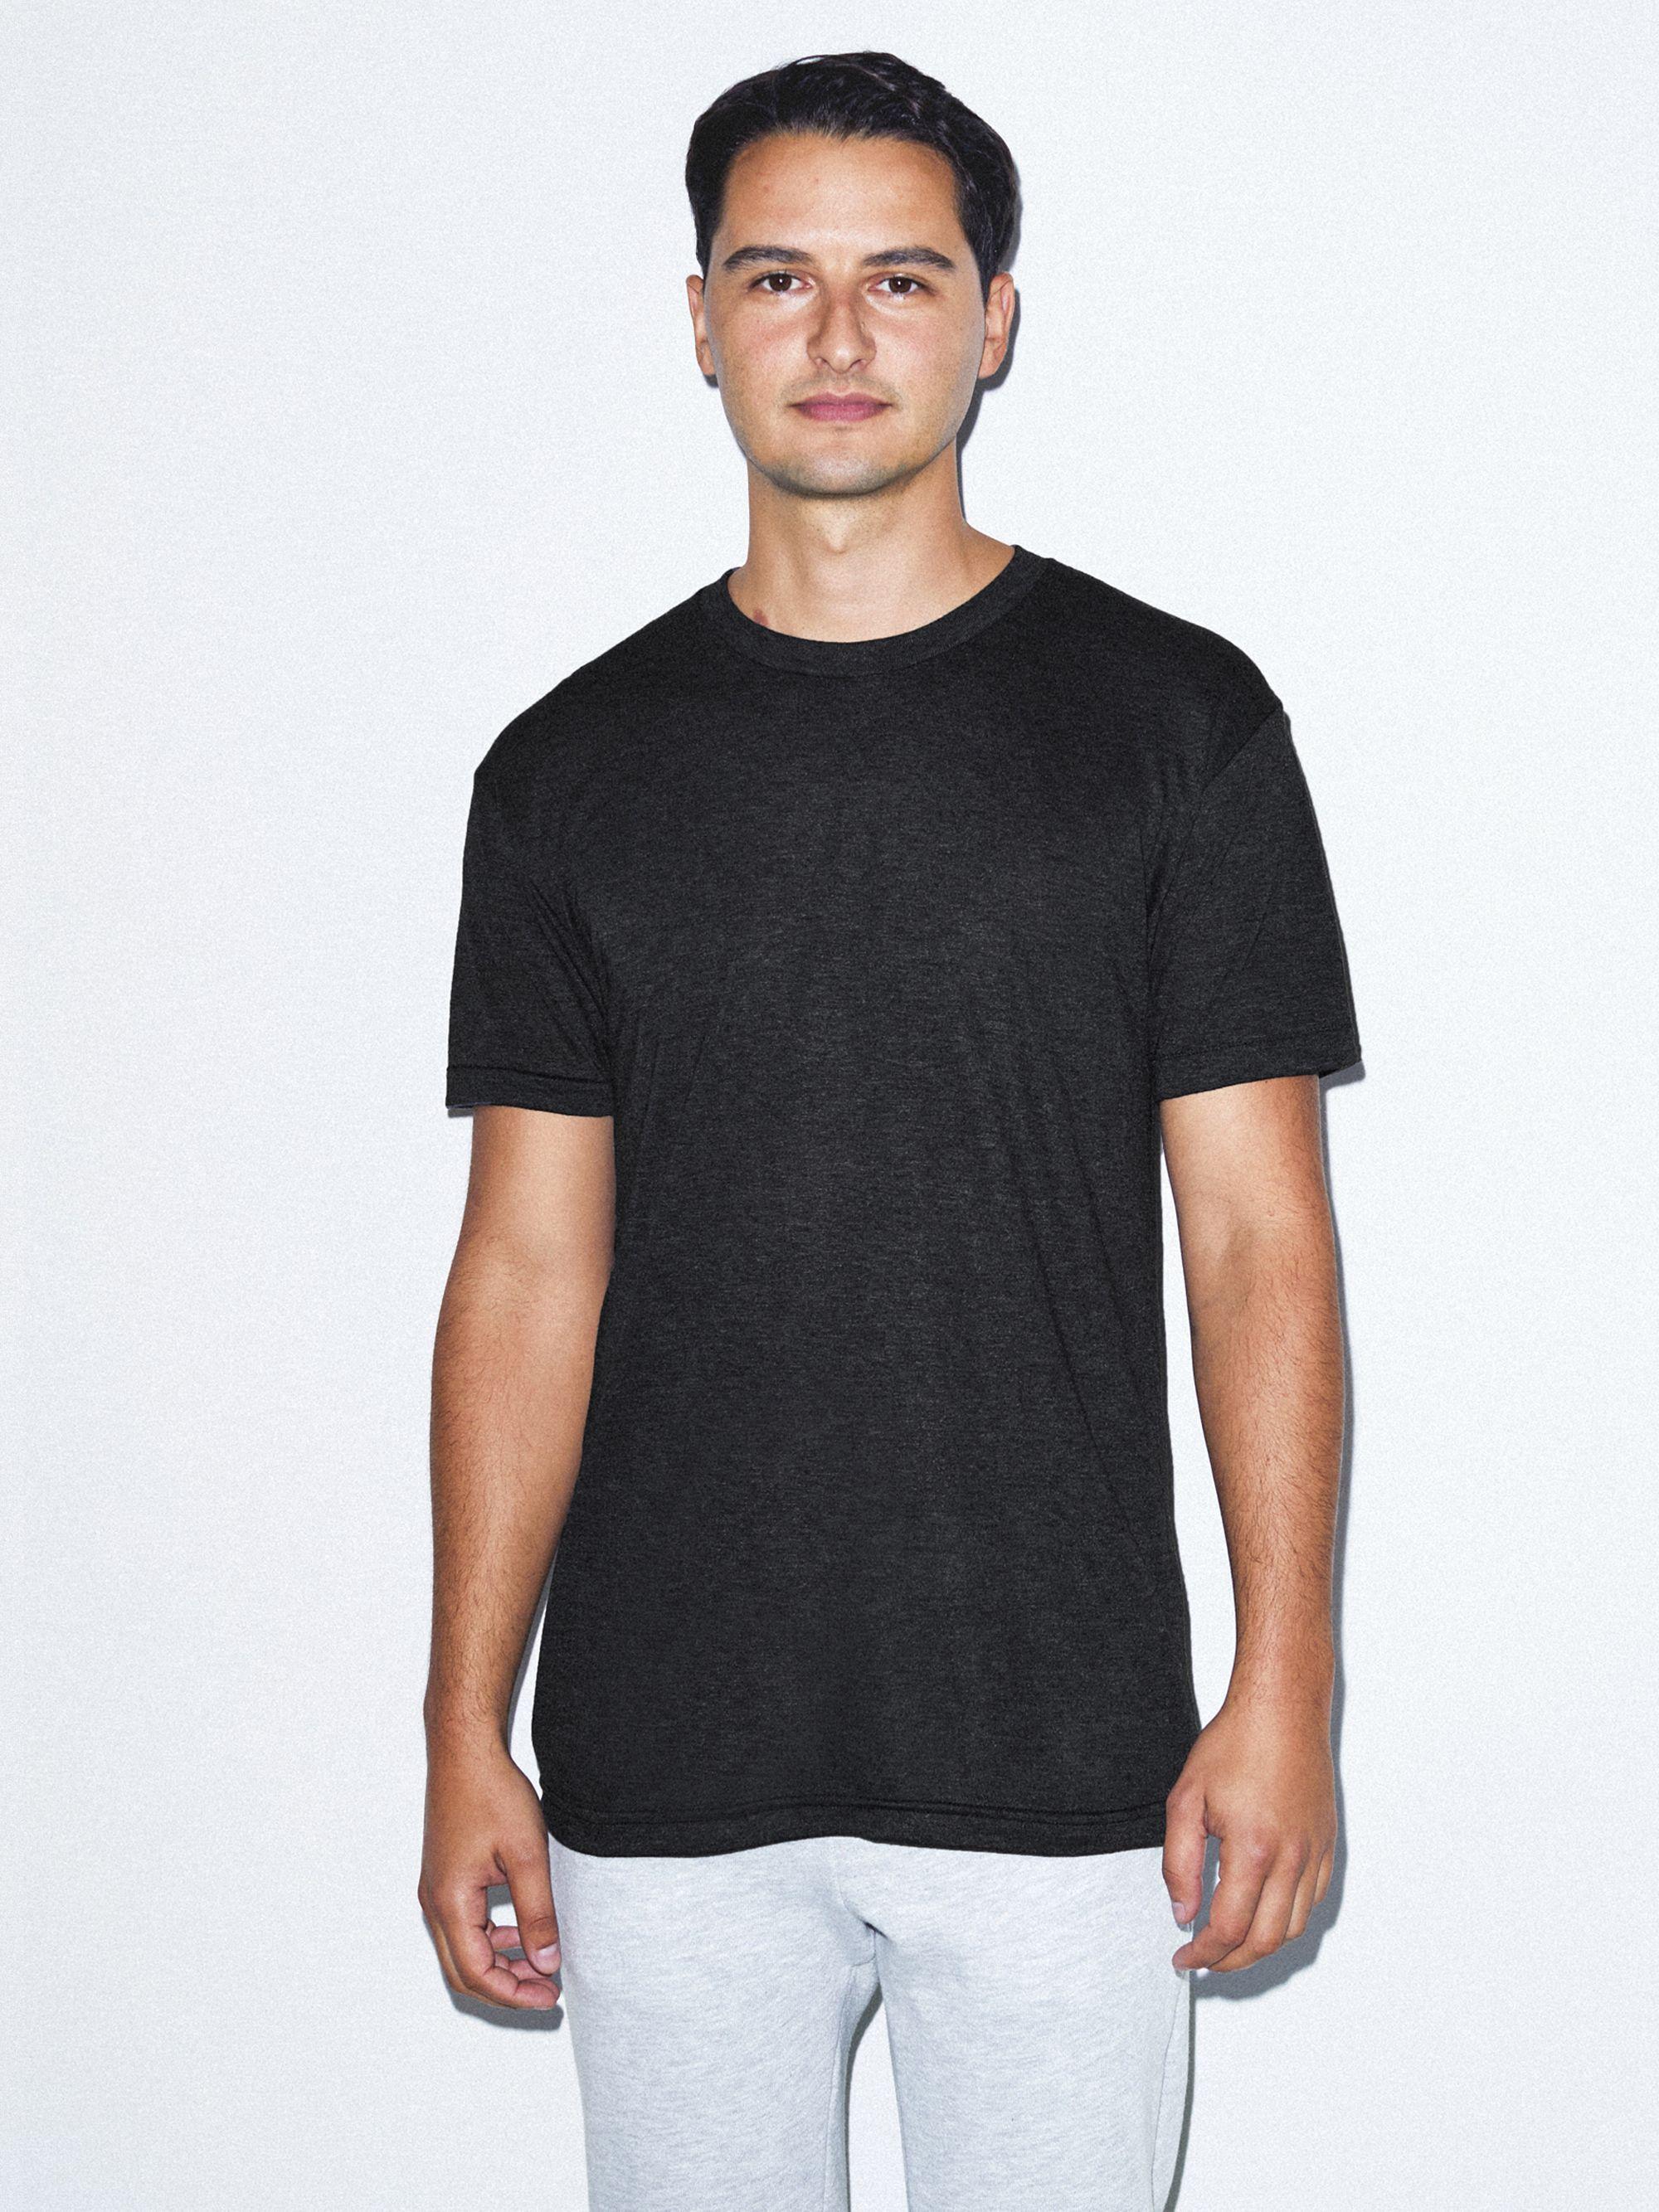 Tri-Blend Crewneck Track T-Shirt | American Apparel